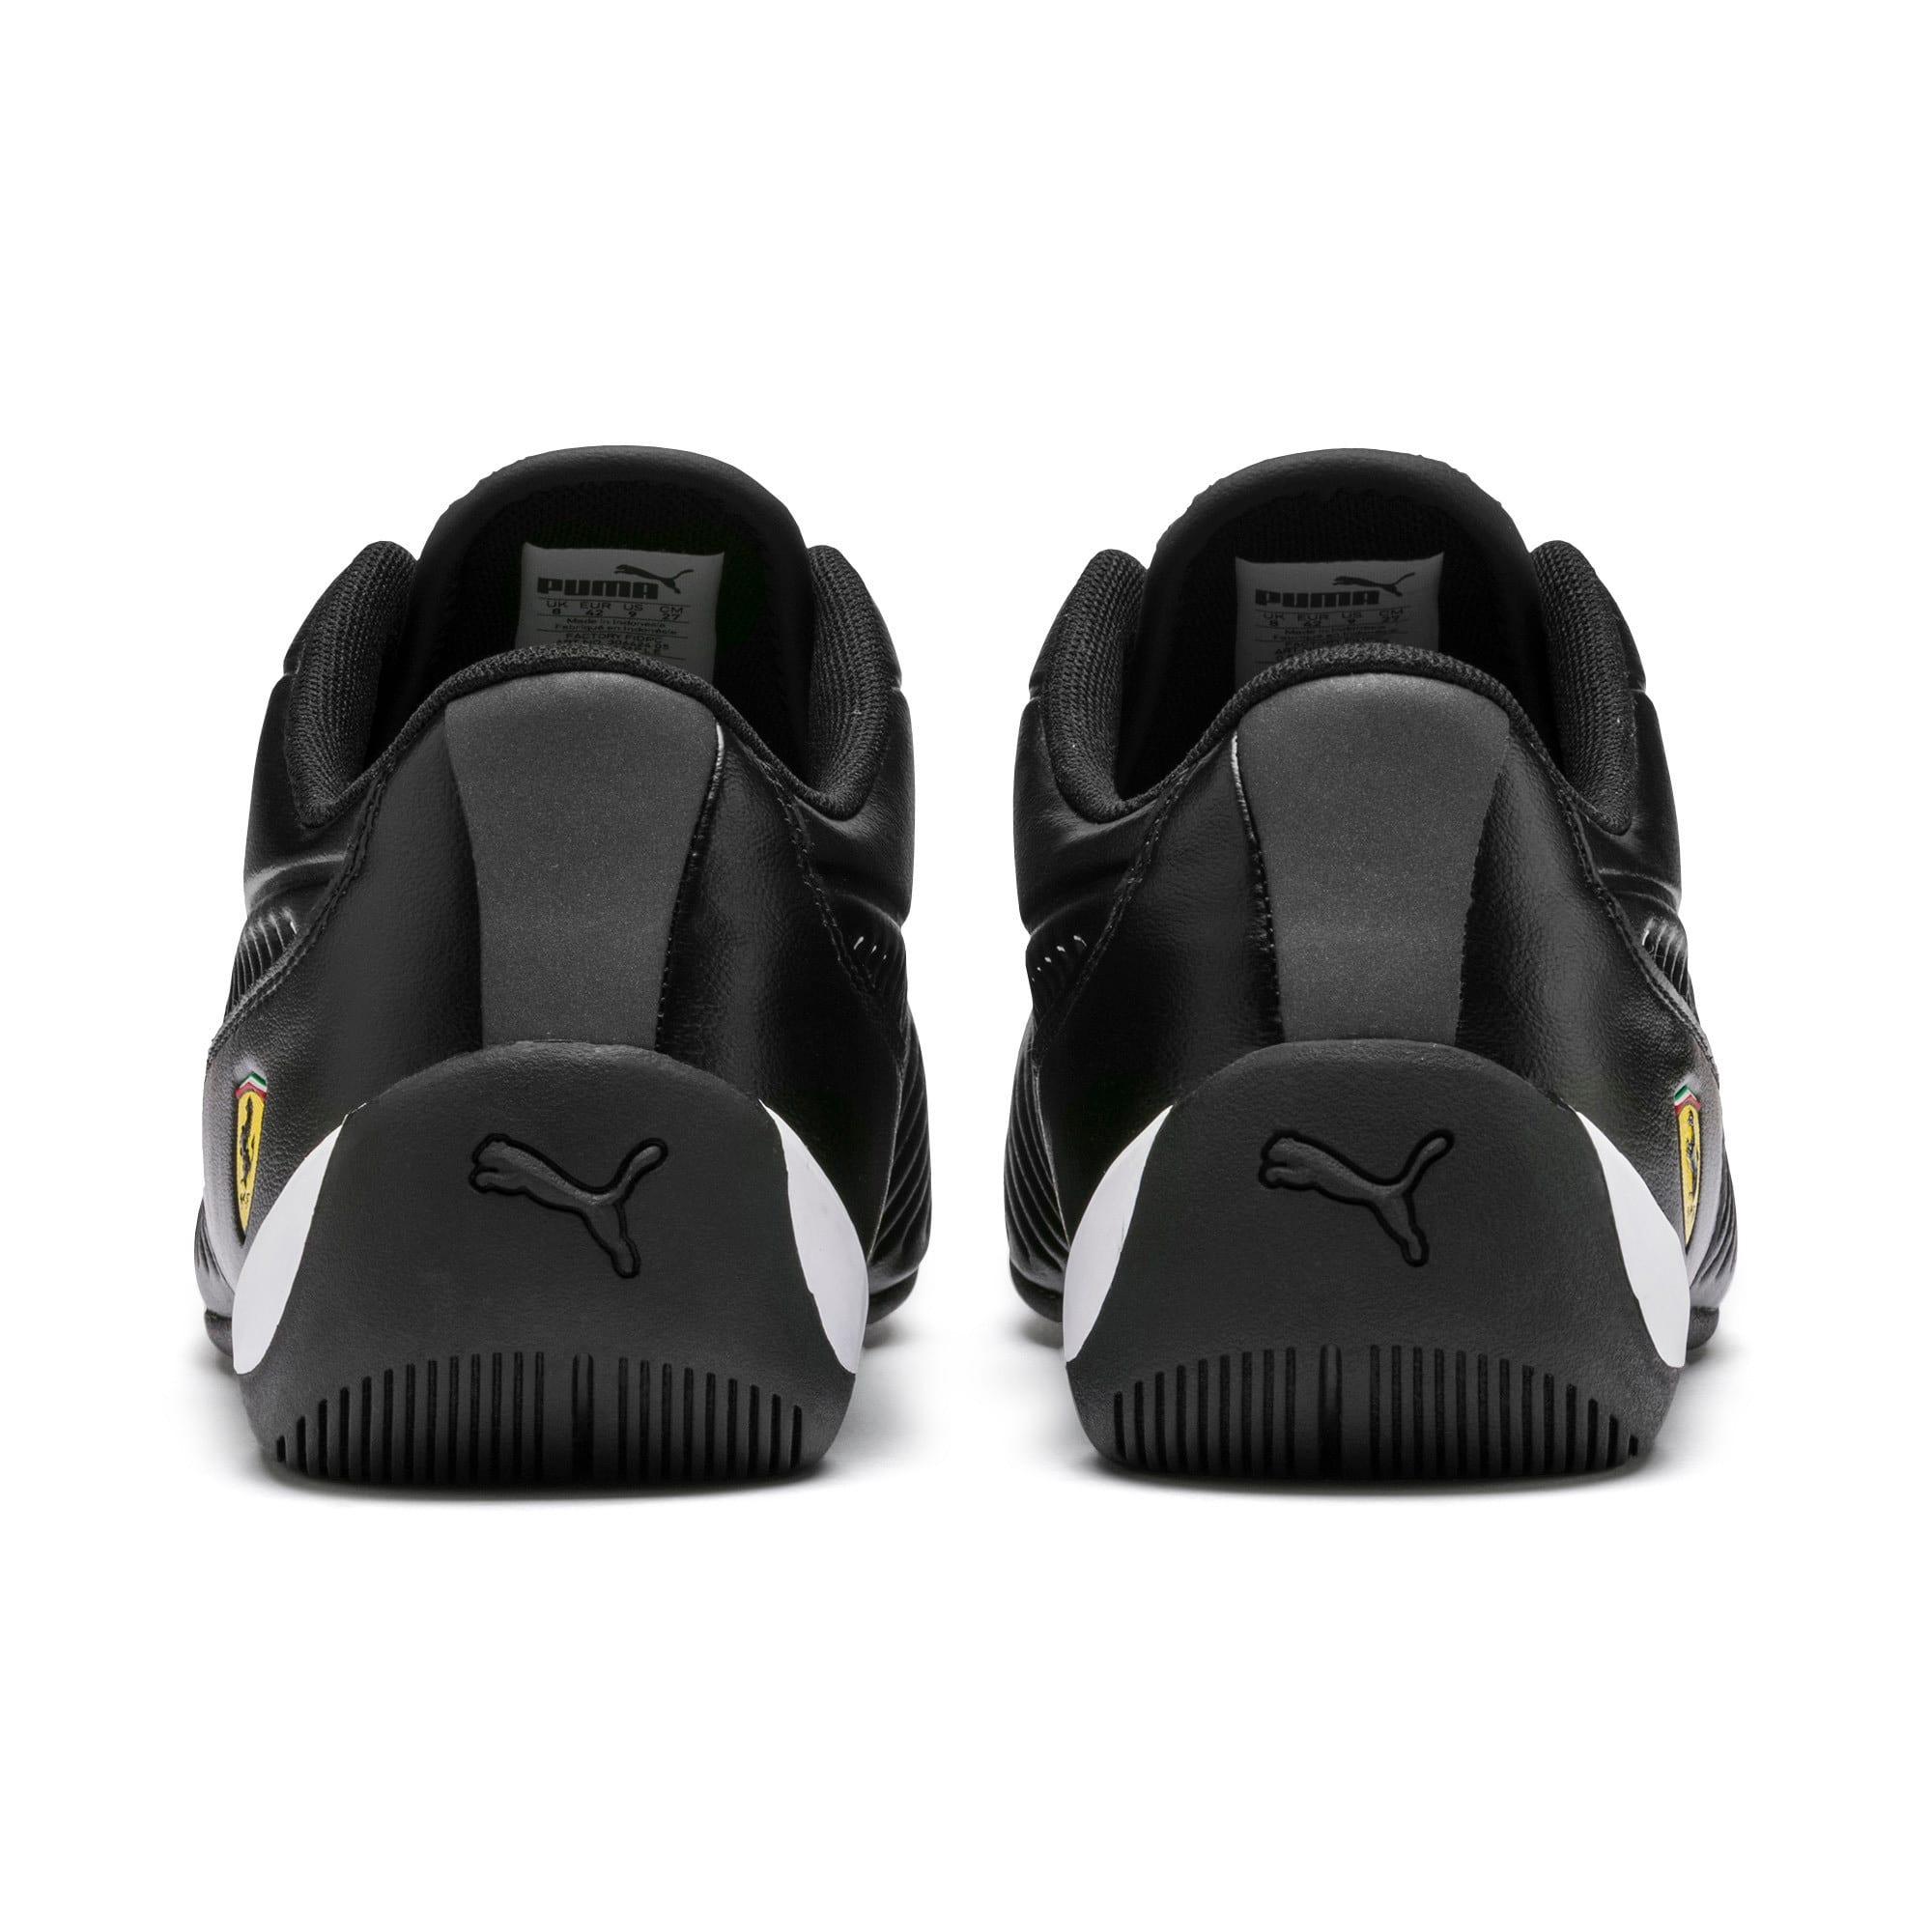 Thumbnail 4 of Scuderia Ferrari Drift Cat 7S Ultra Men's Shoes, Puma Black-Puma White, medium